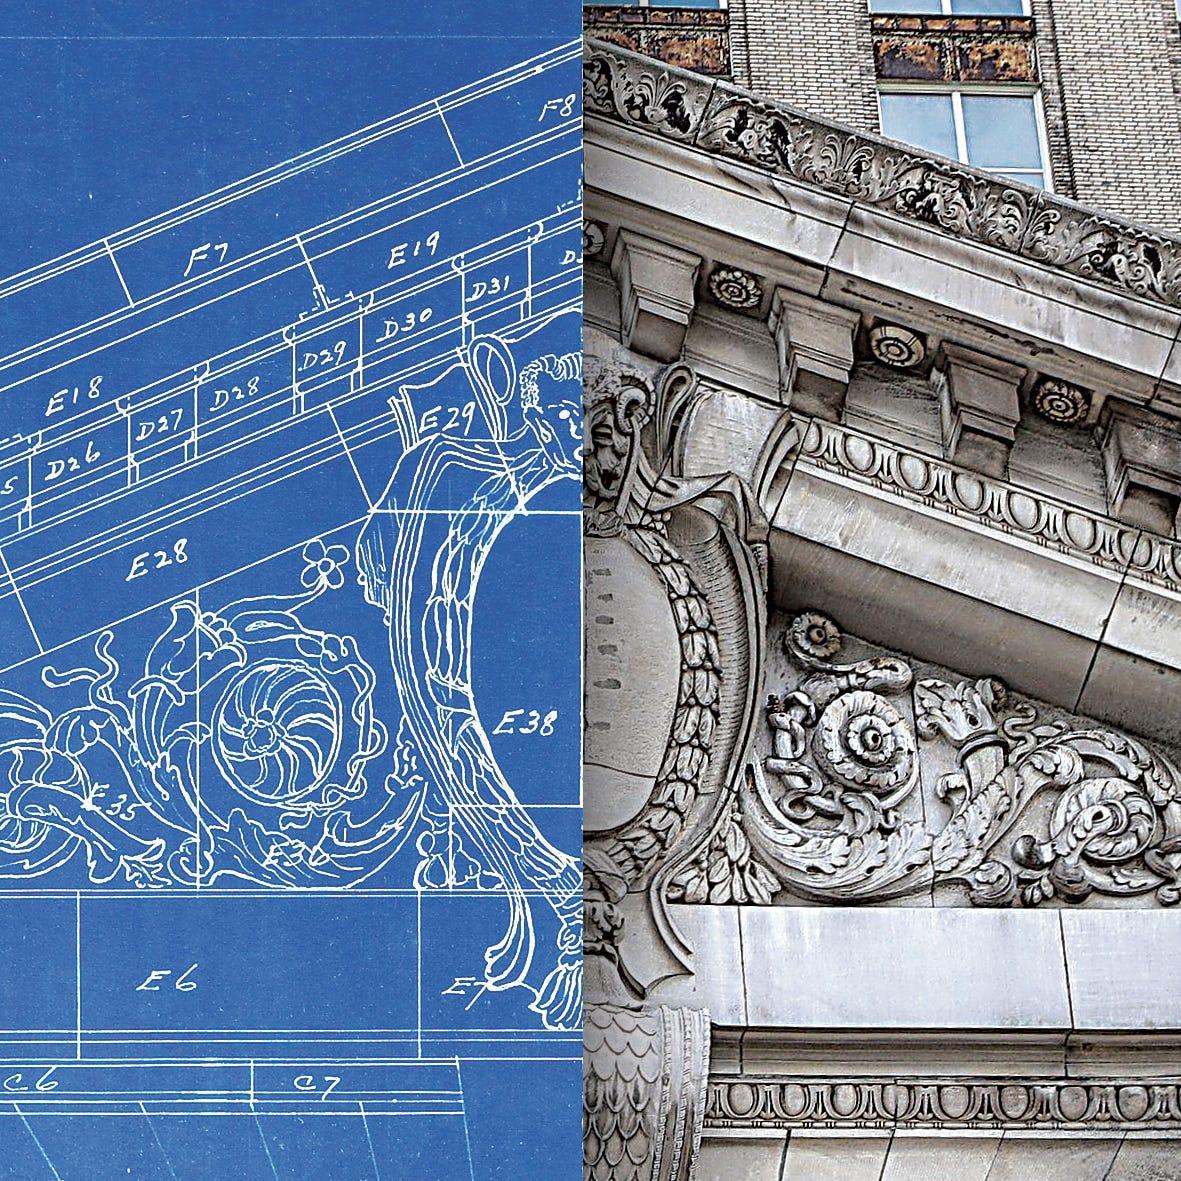 Detroit train station blueprint illustration